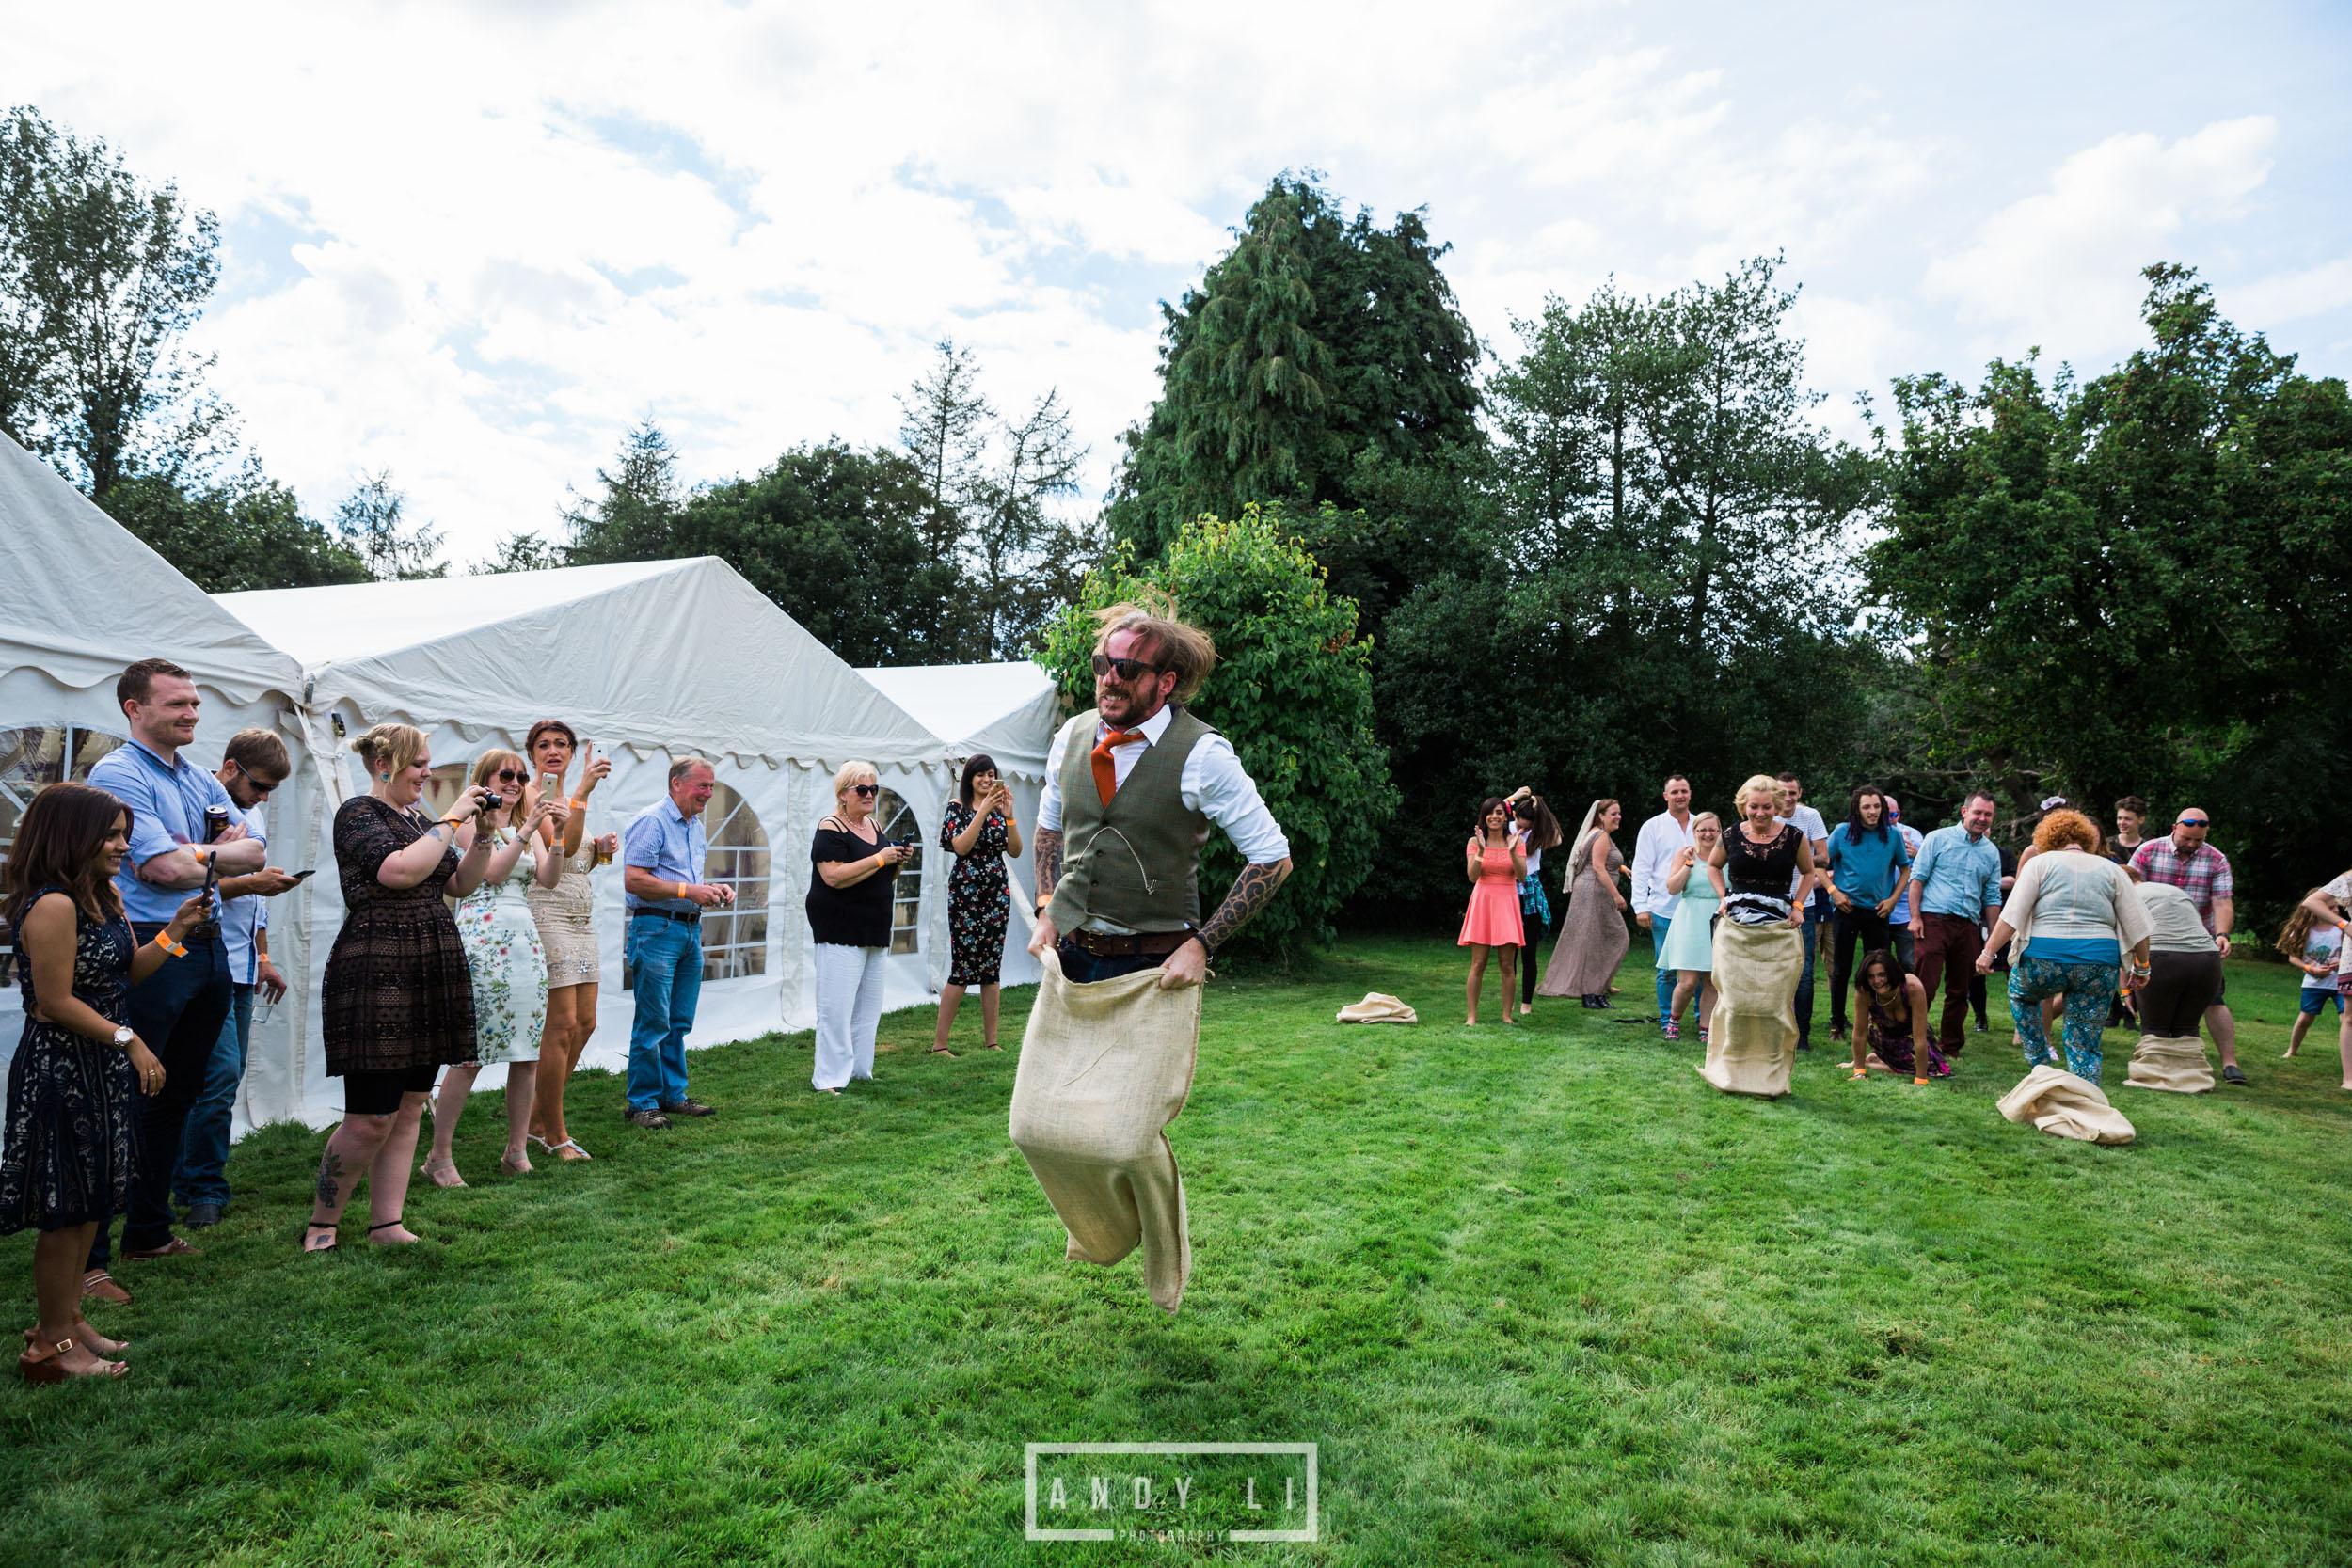 Festival Wedding Shropshire-Andy Li Photography-264.jpg